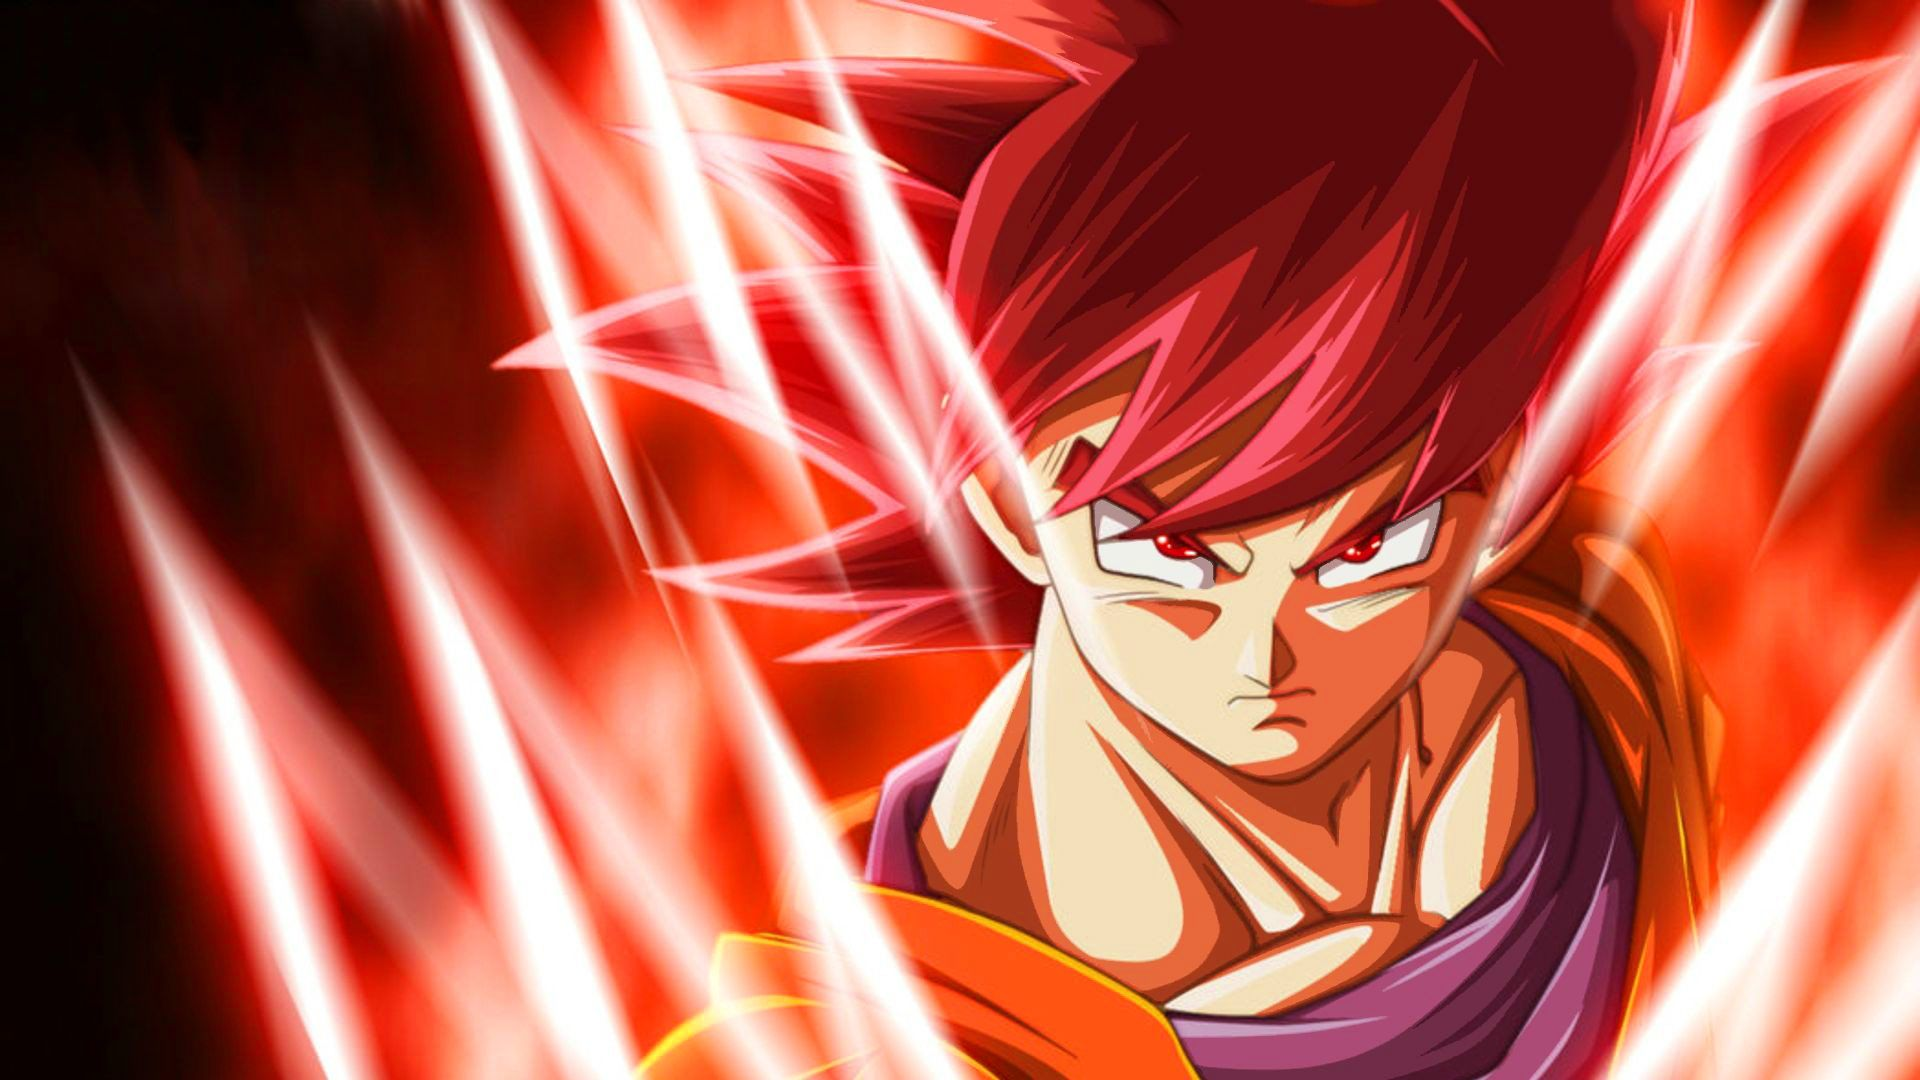 Goku Super Saiyan God Wallpapers Goku Super Saiyan God 1920x1080